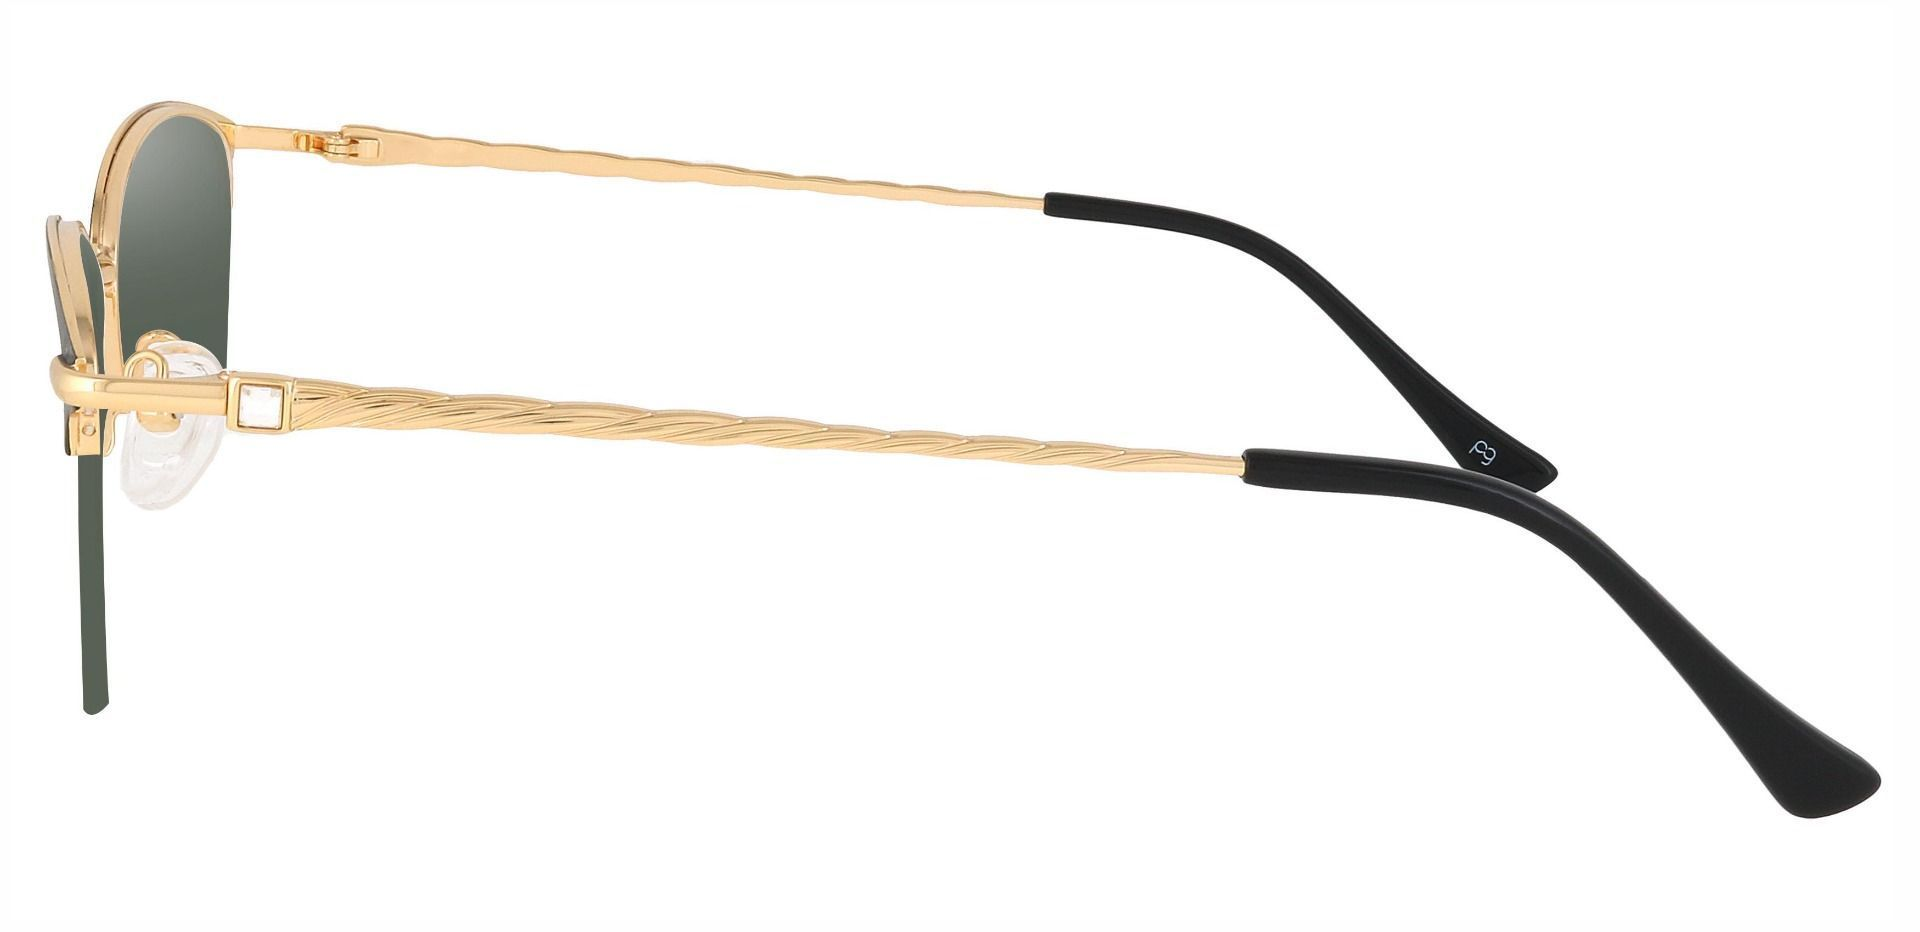 Marigold Rectangle Progressive Sunglasses - Black Frame With Green Lenses